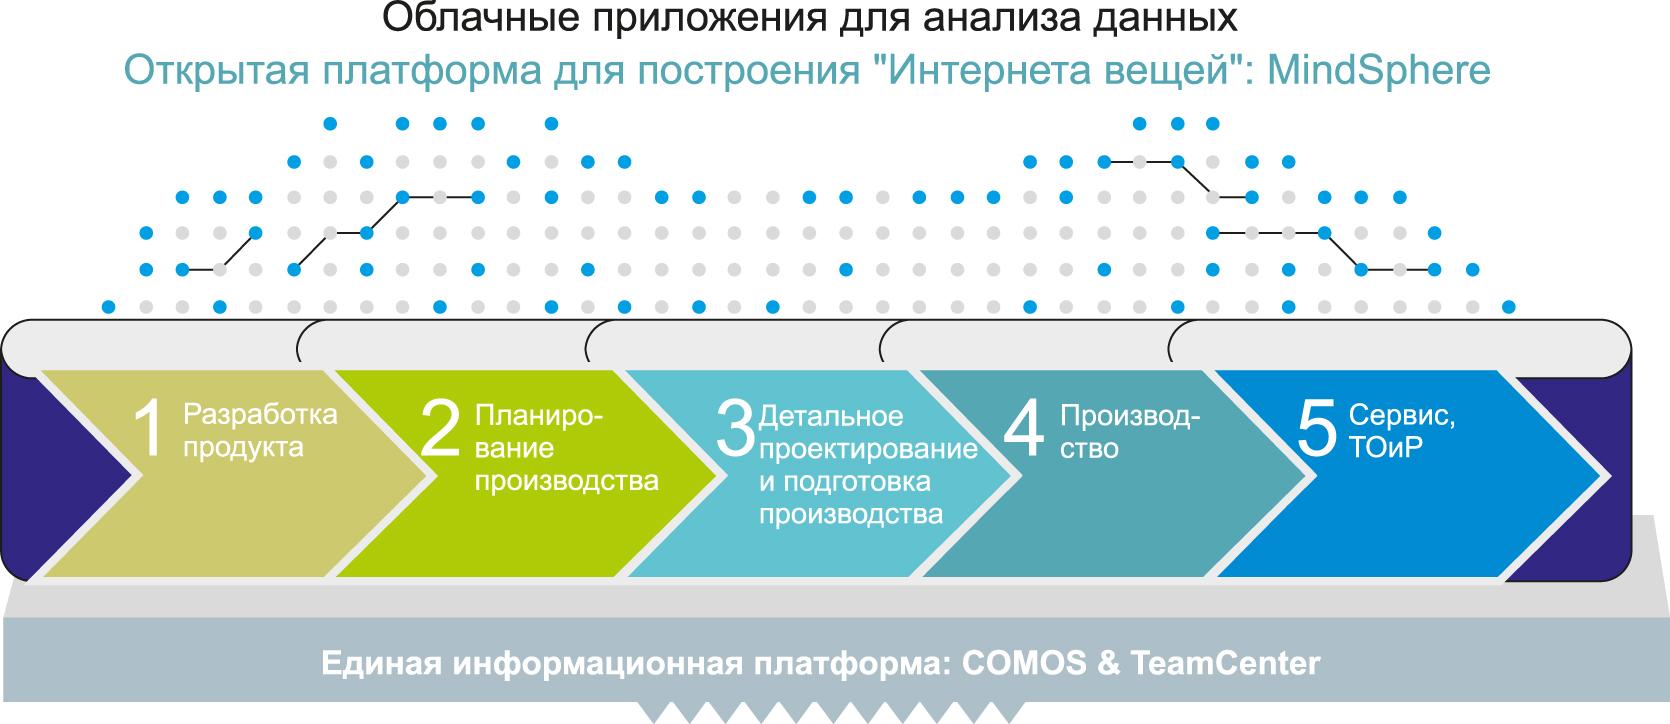 Схема реализации пакета инжиниринговых услуг фото 643